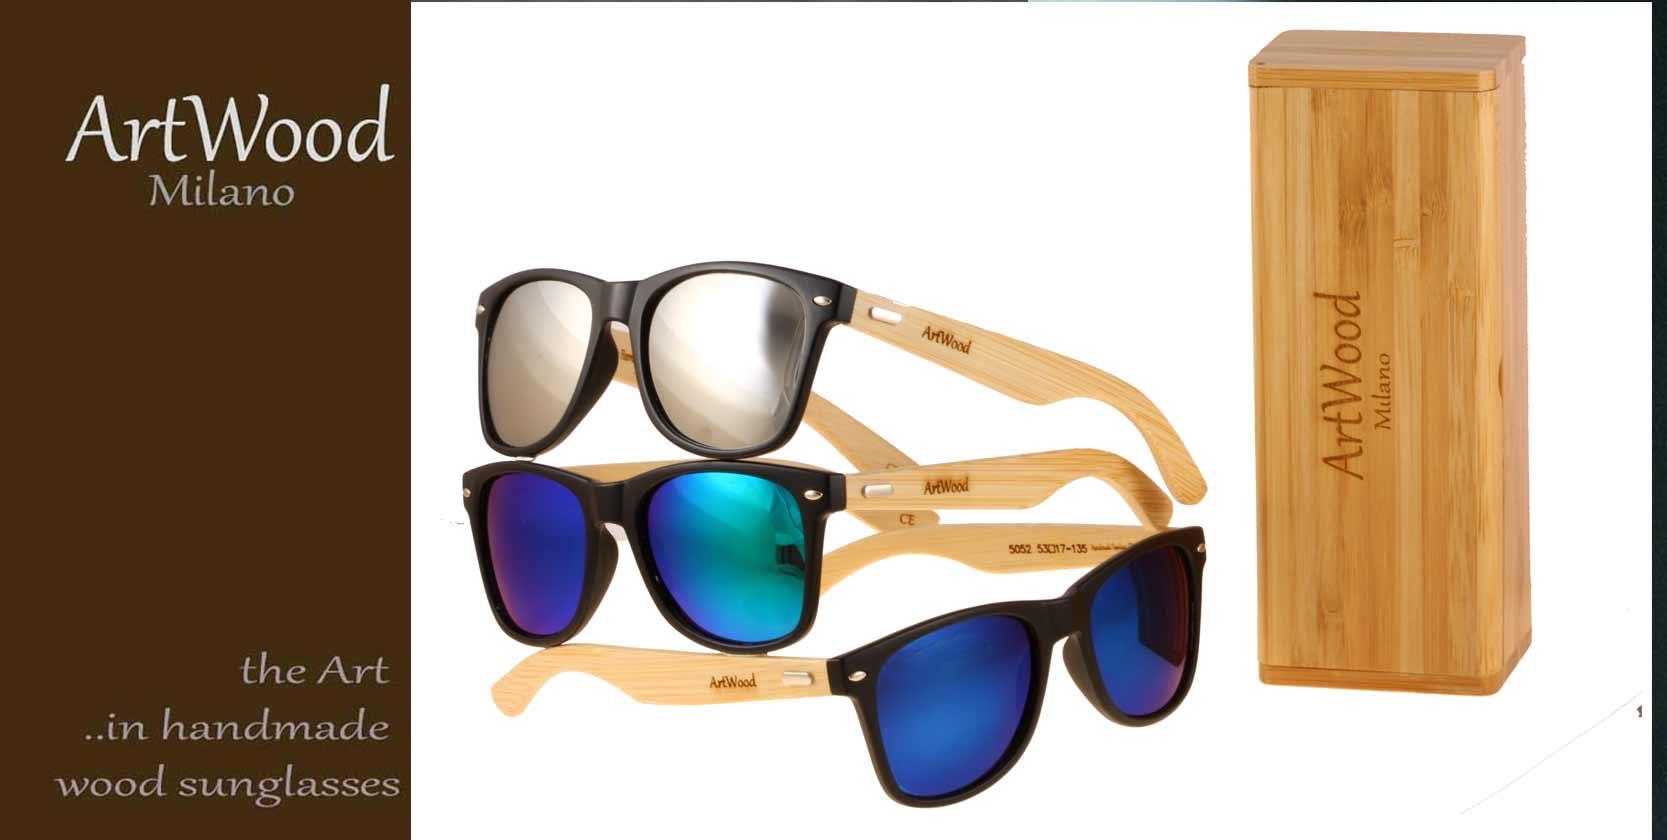 ARTWOOD-MILANO Ξύλινα γυαλιά ηλίου Artwood-Milano 5bc1f275725